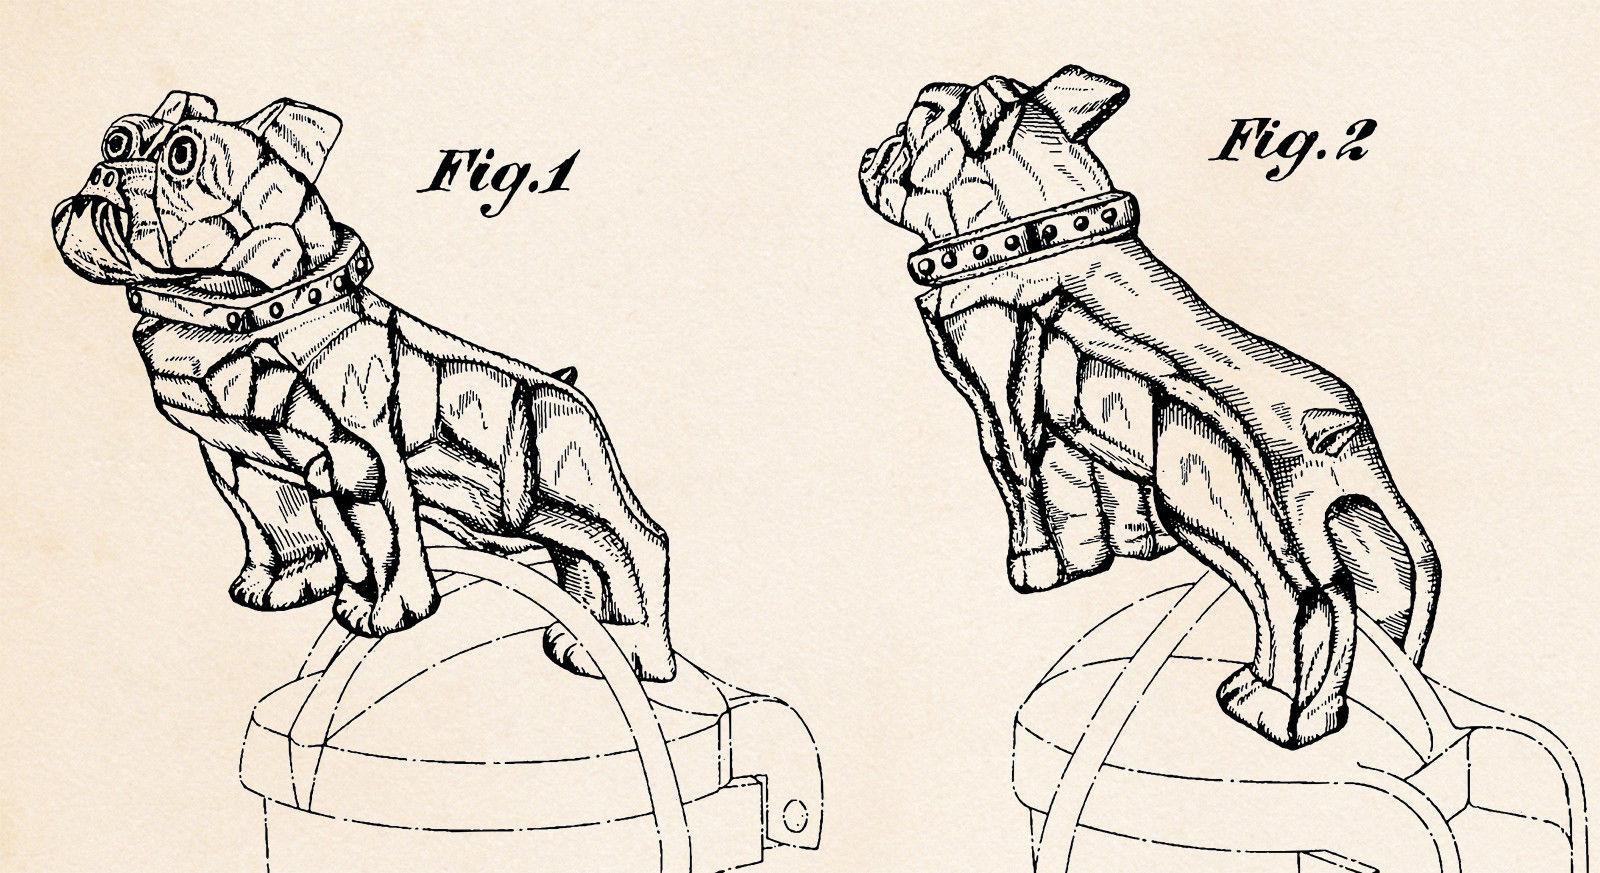 1932 Mack Truck Bulldog Hood Ornament Mascot Emblem Radiator Cap Patent Gifts